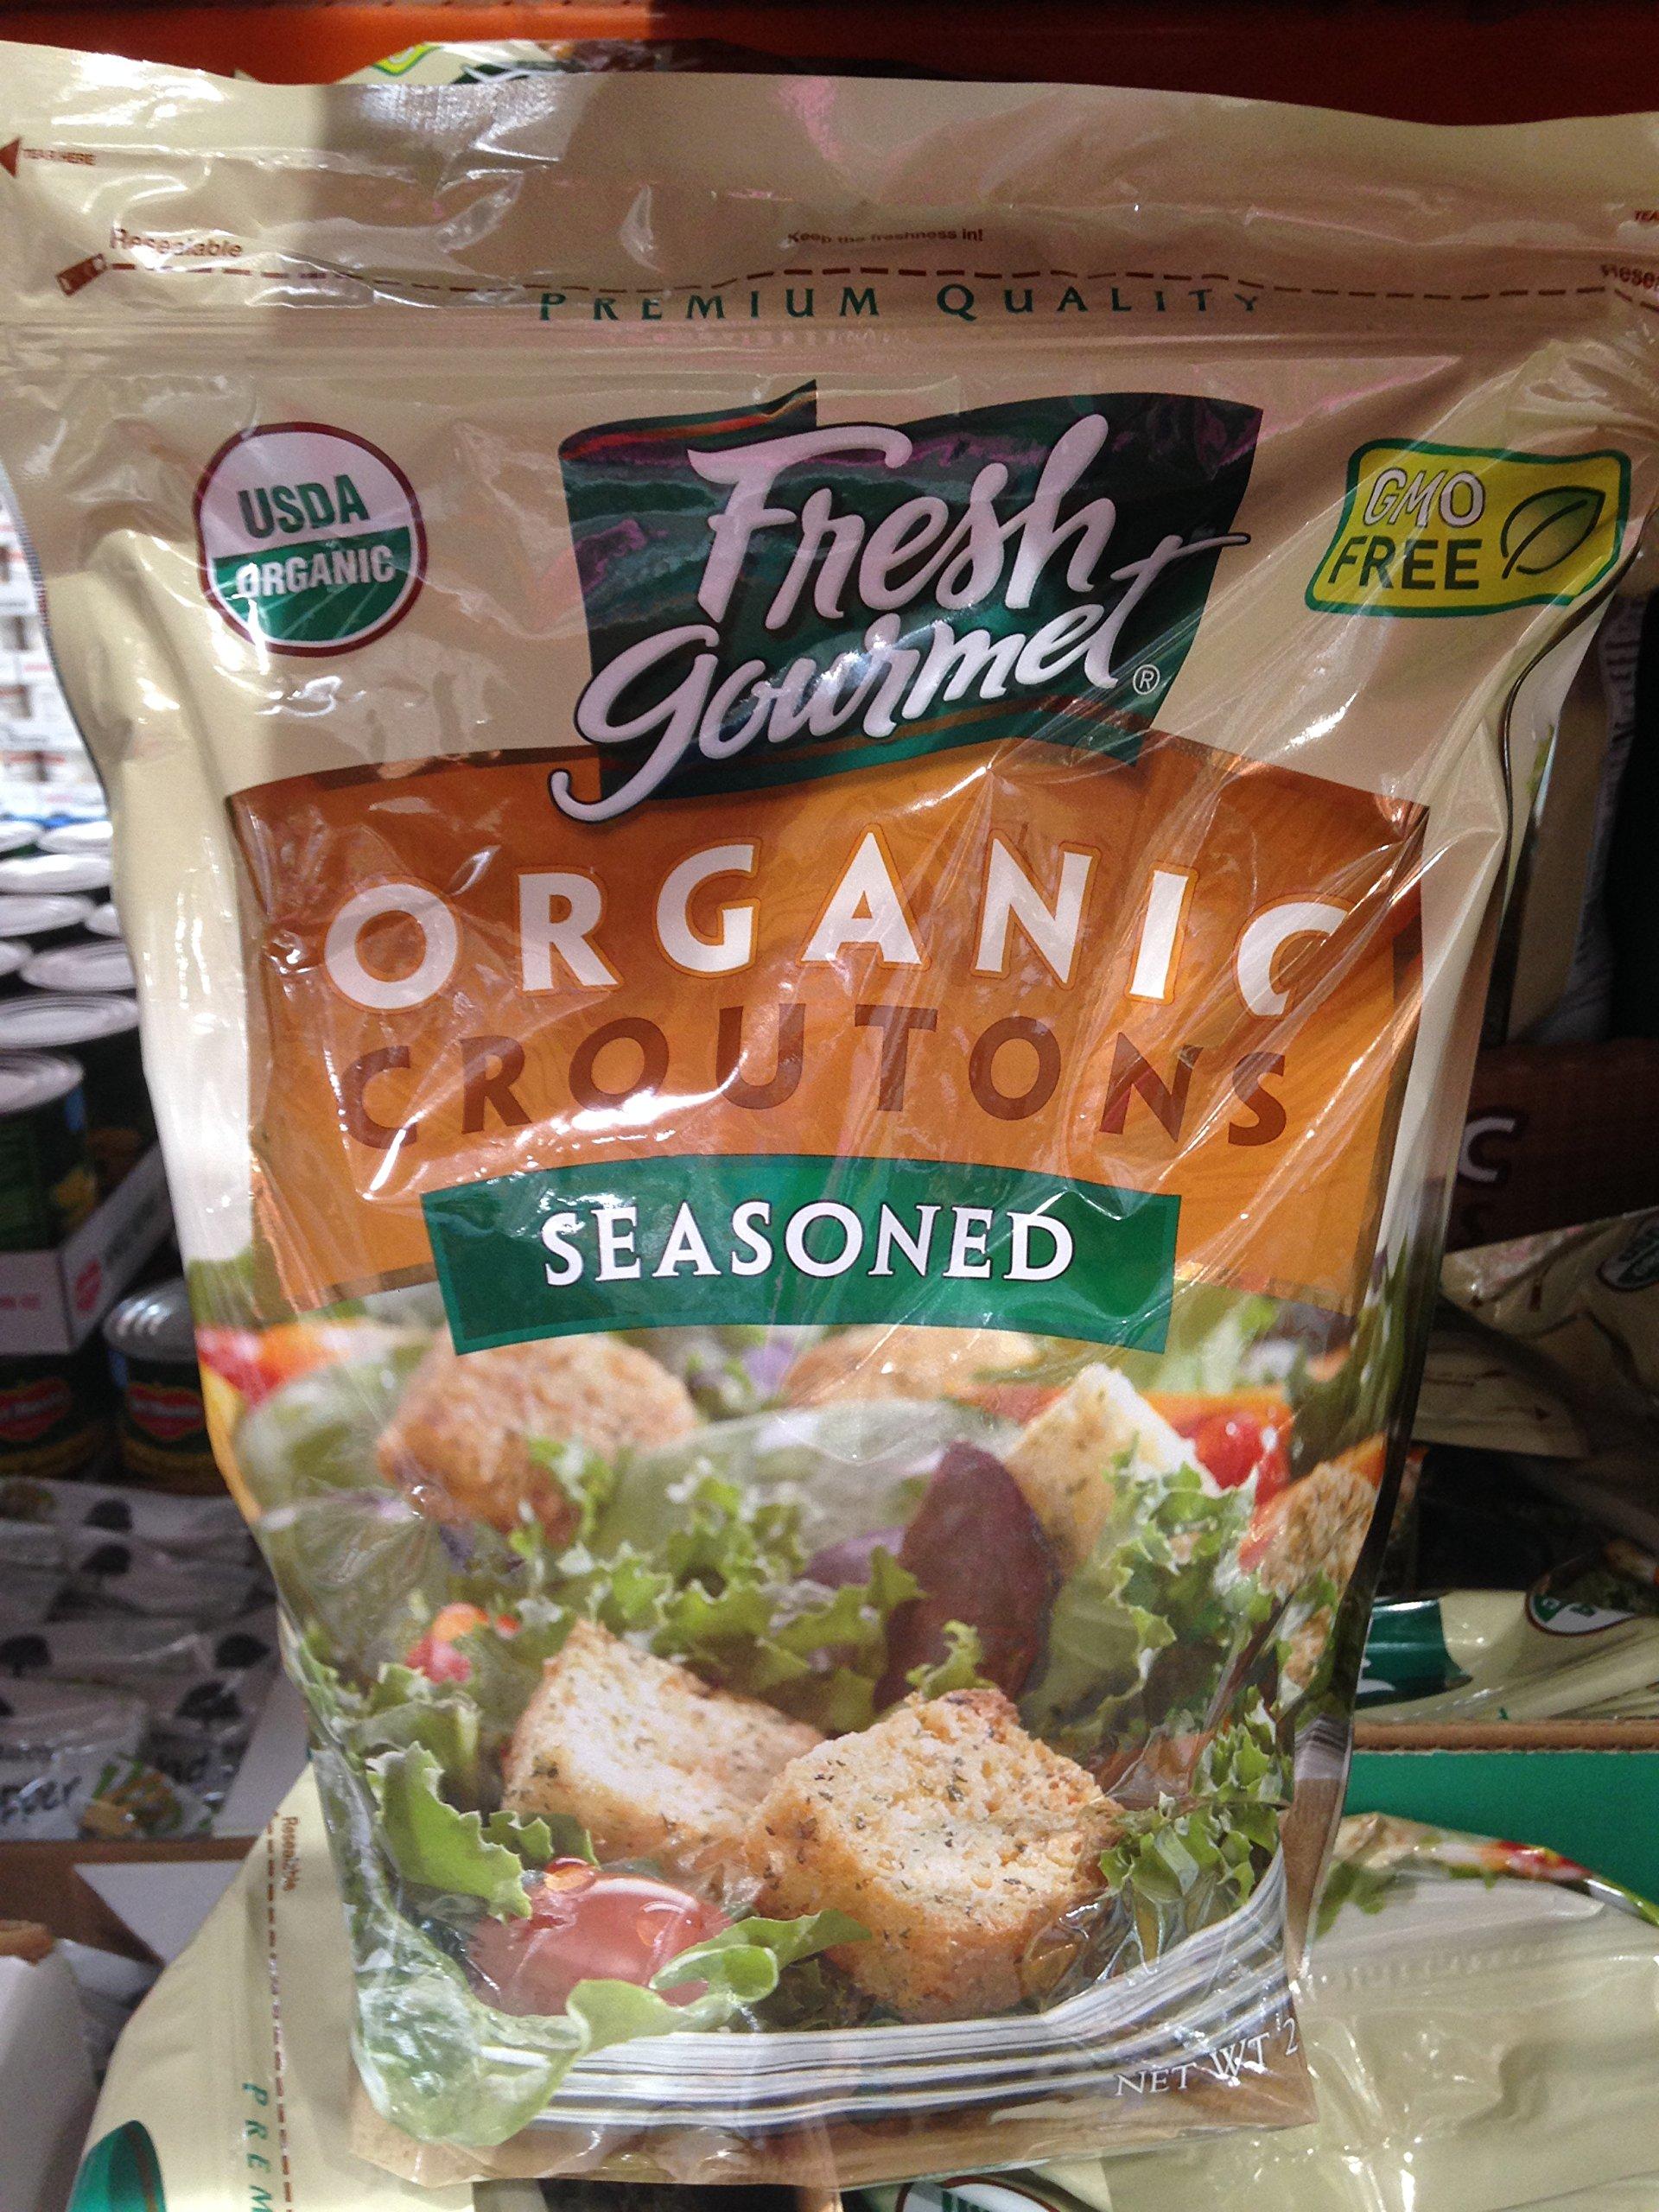 Fresh gourmet organic croutons 32 oz (pack of 2)